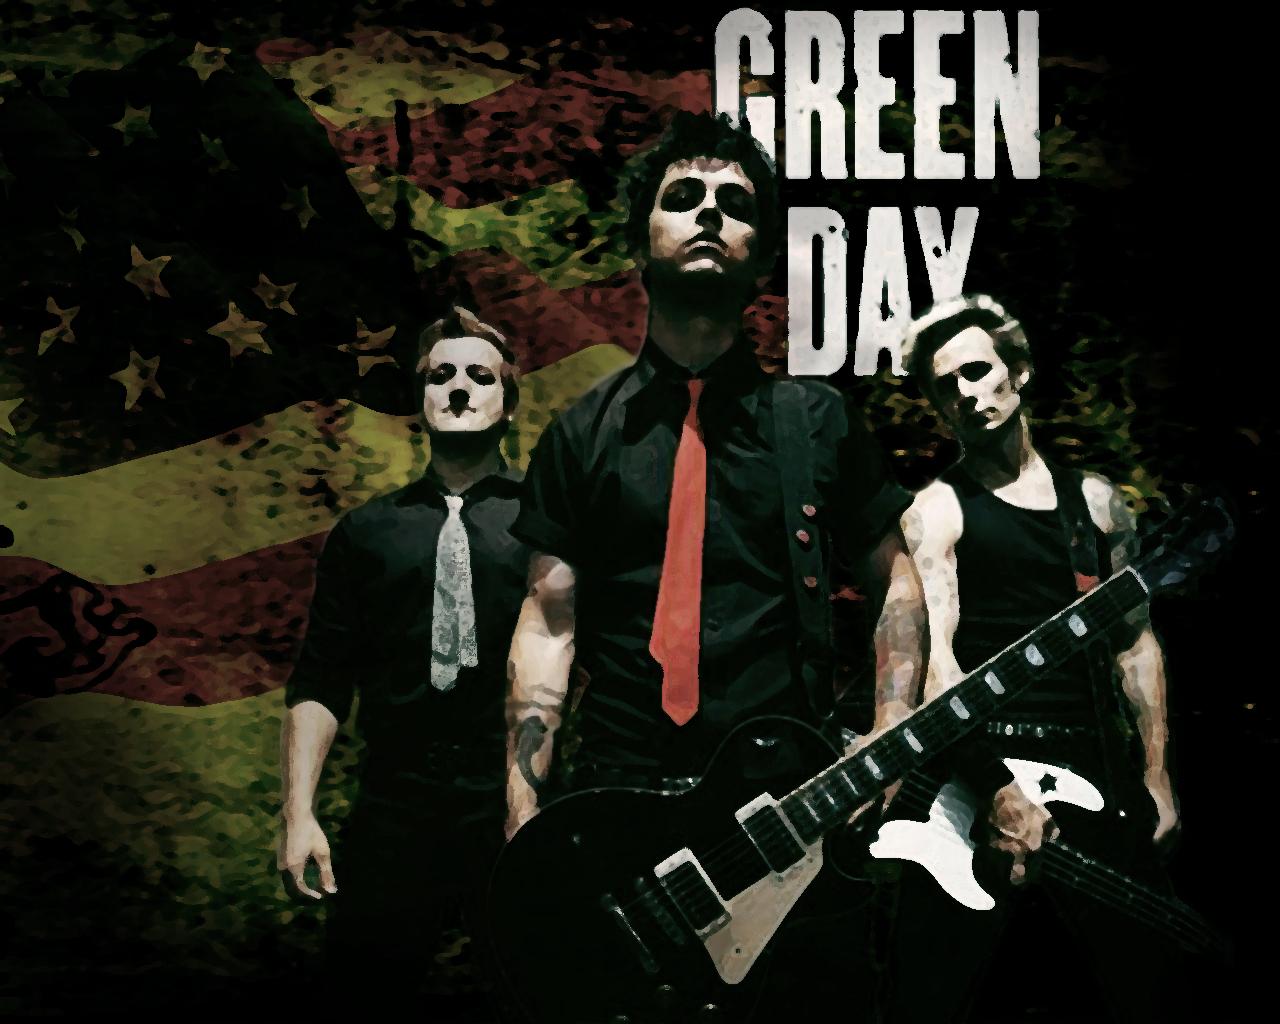 Descargar MP3 de Gren Day 21 Guns, Full Musica gratis